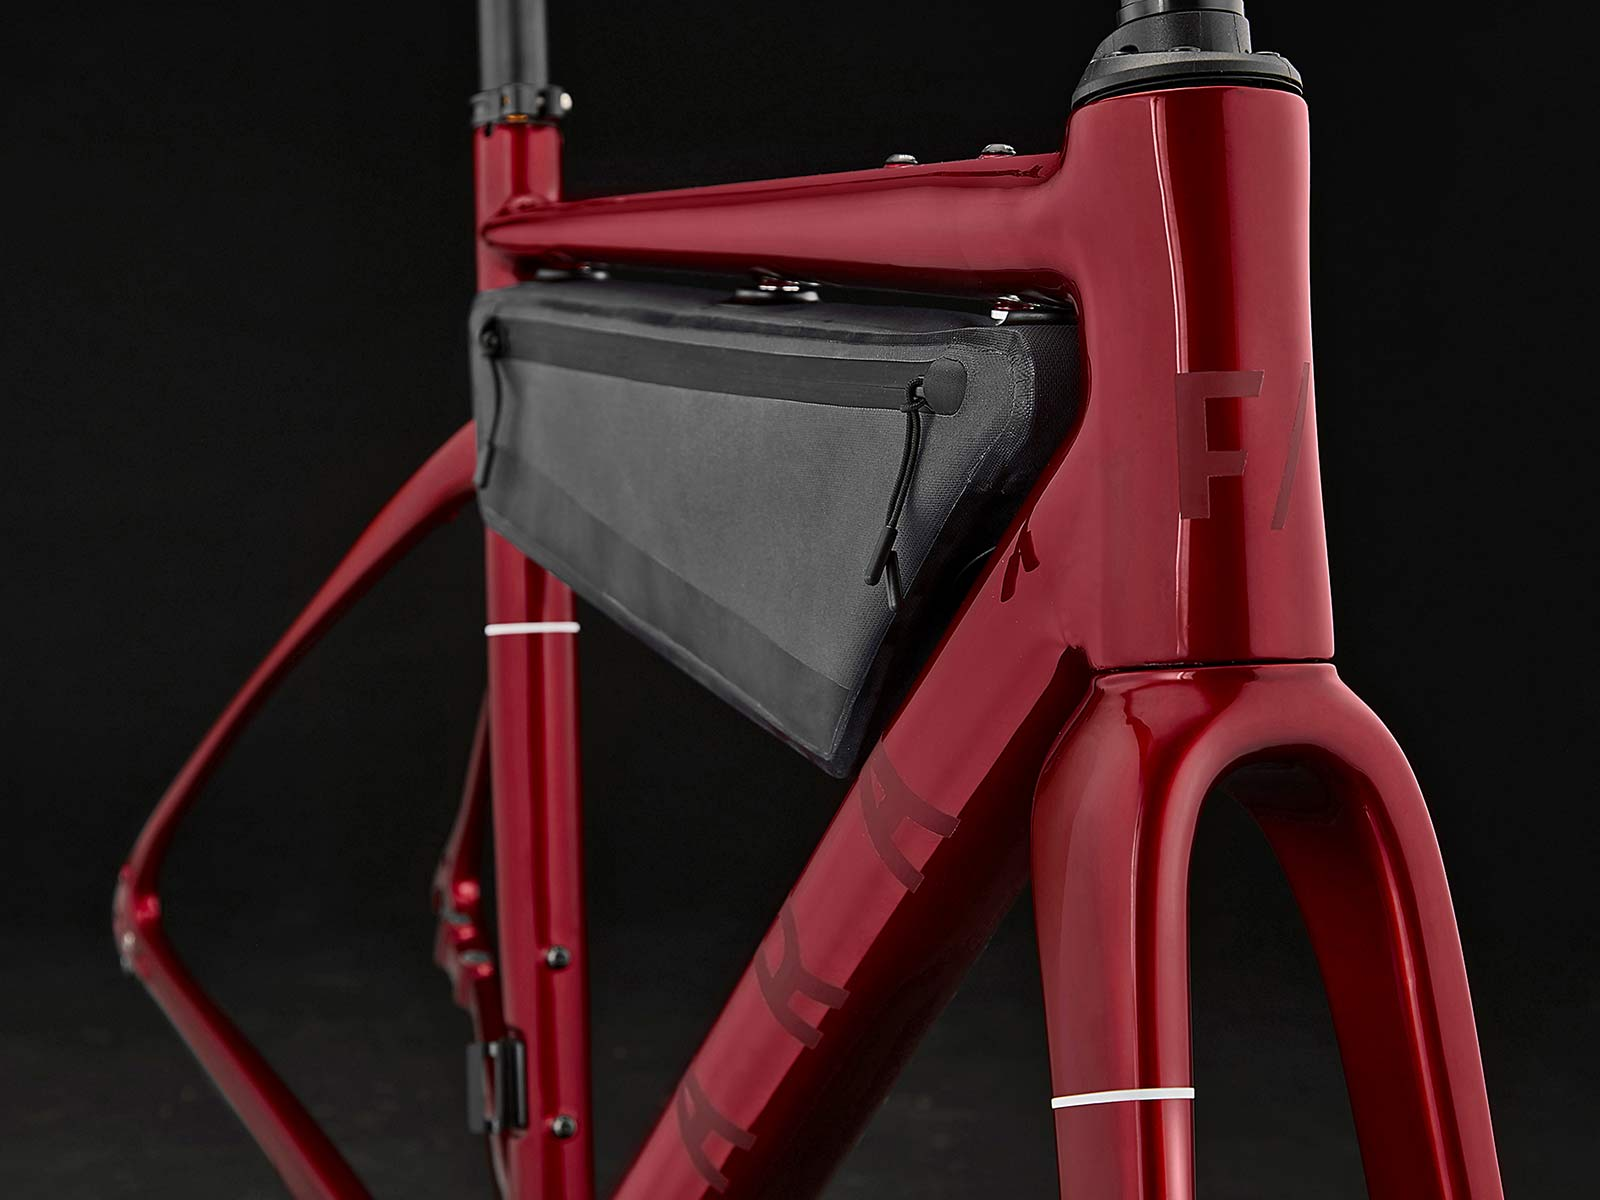 2021 Fara F-AR all-road bike ltd Signature Edition, carbon endurance gravel road bike with integrated bikepacking bags,red detail